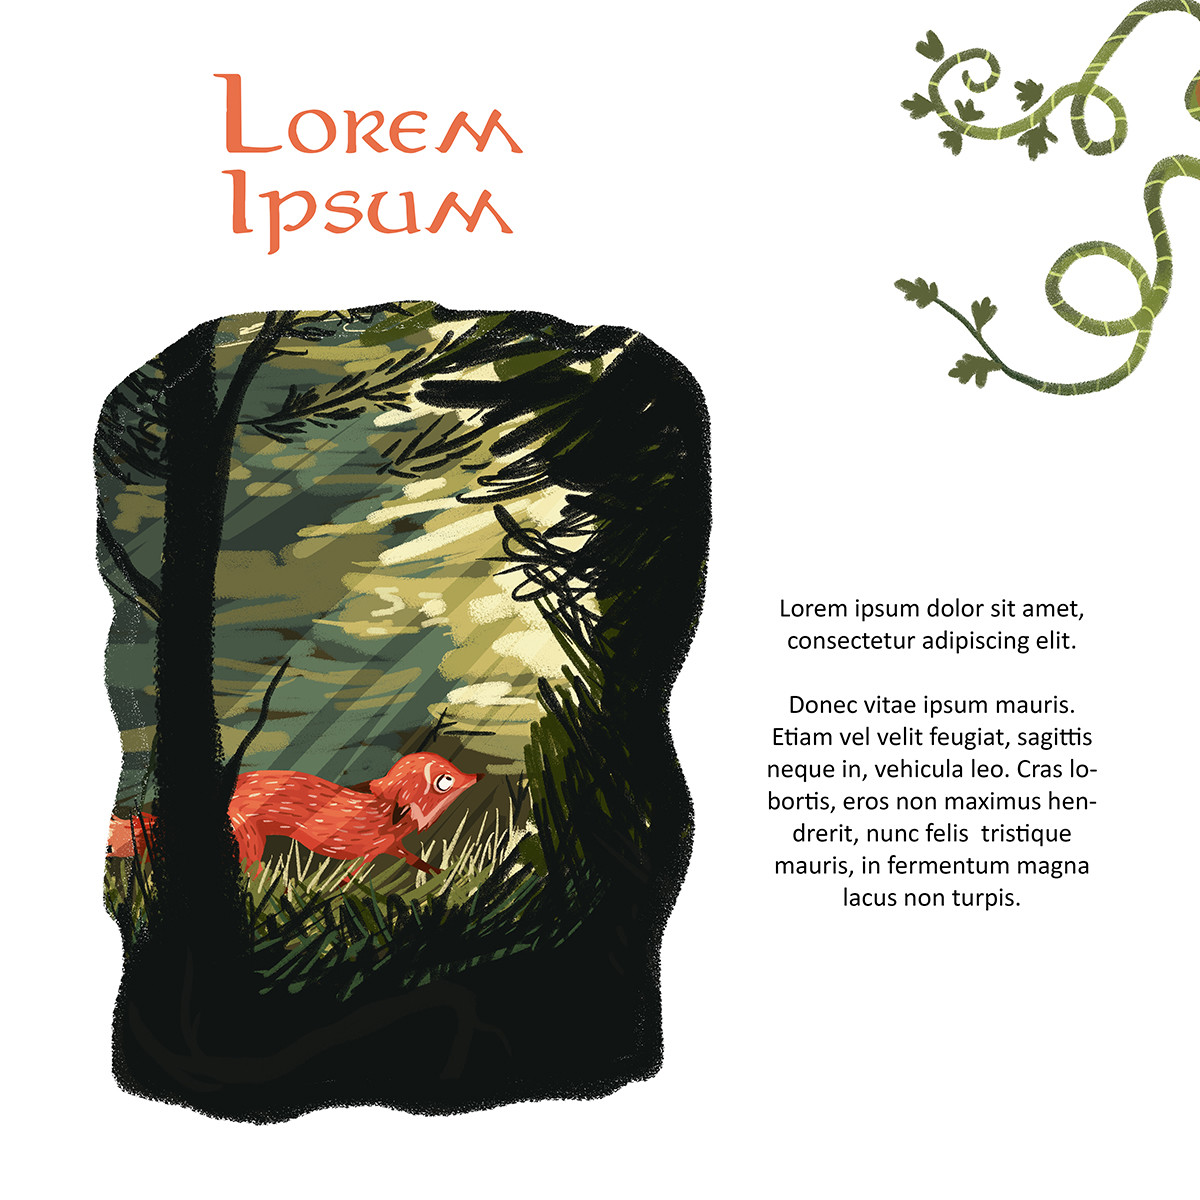 Vanessa morales fox2 lorem ipsum